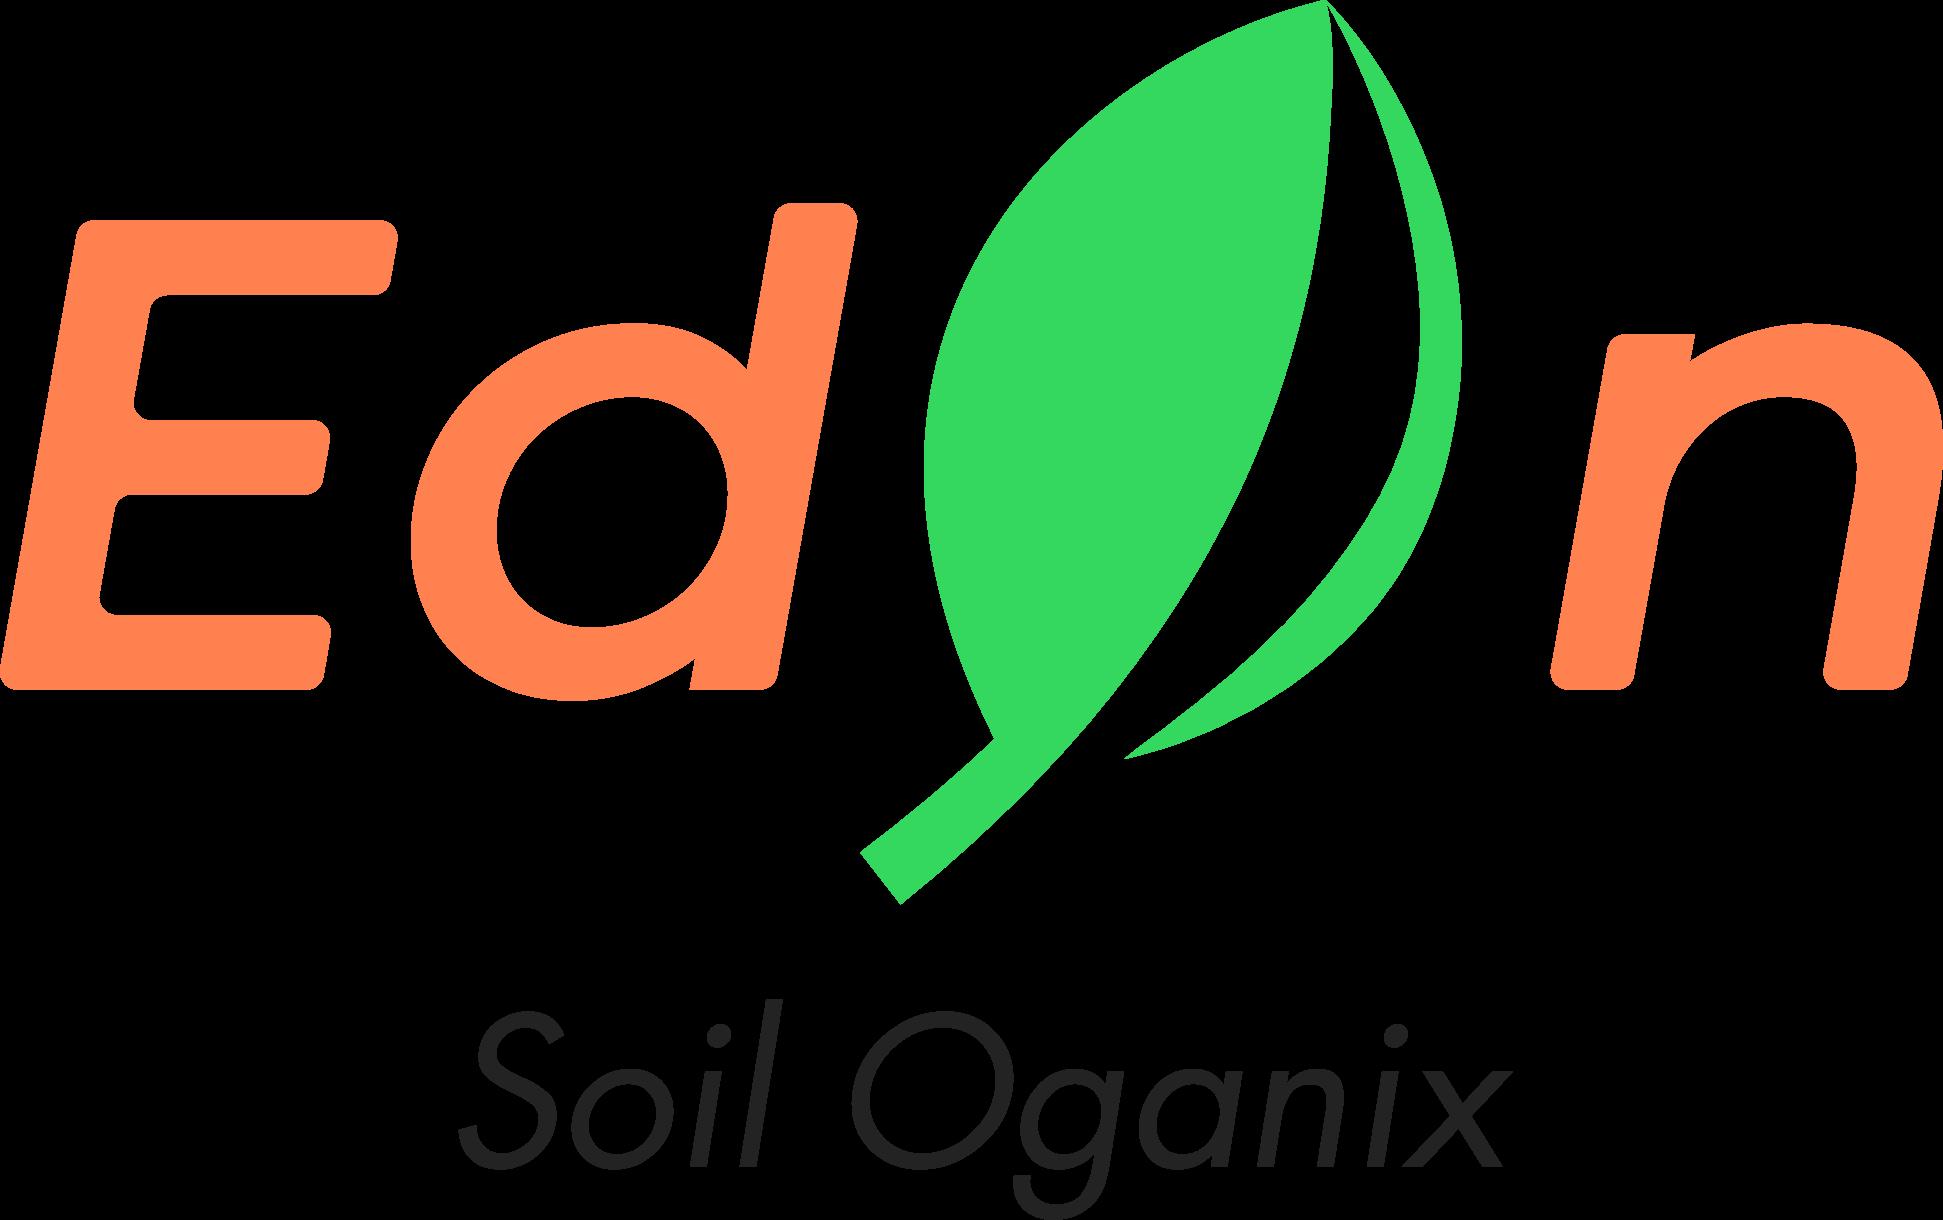 edon soil organix logo